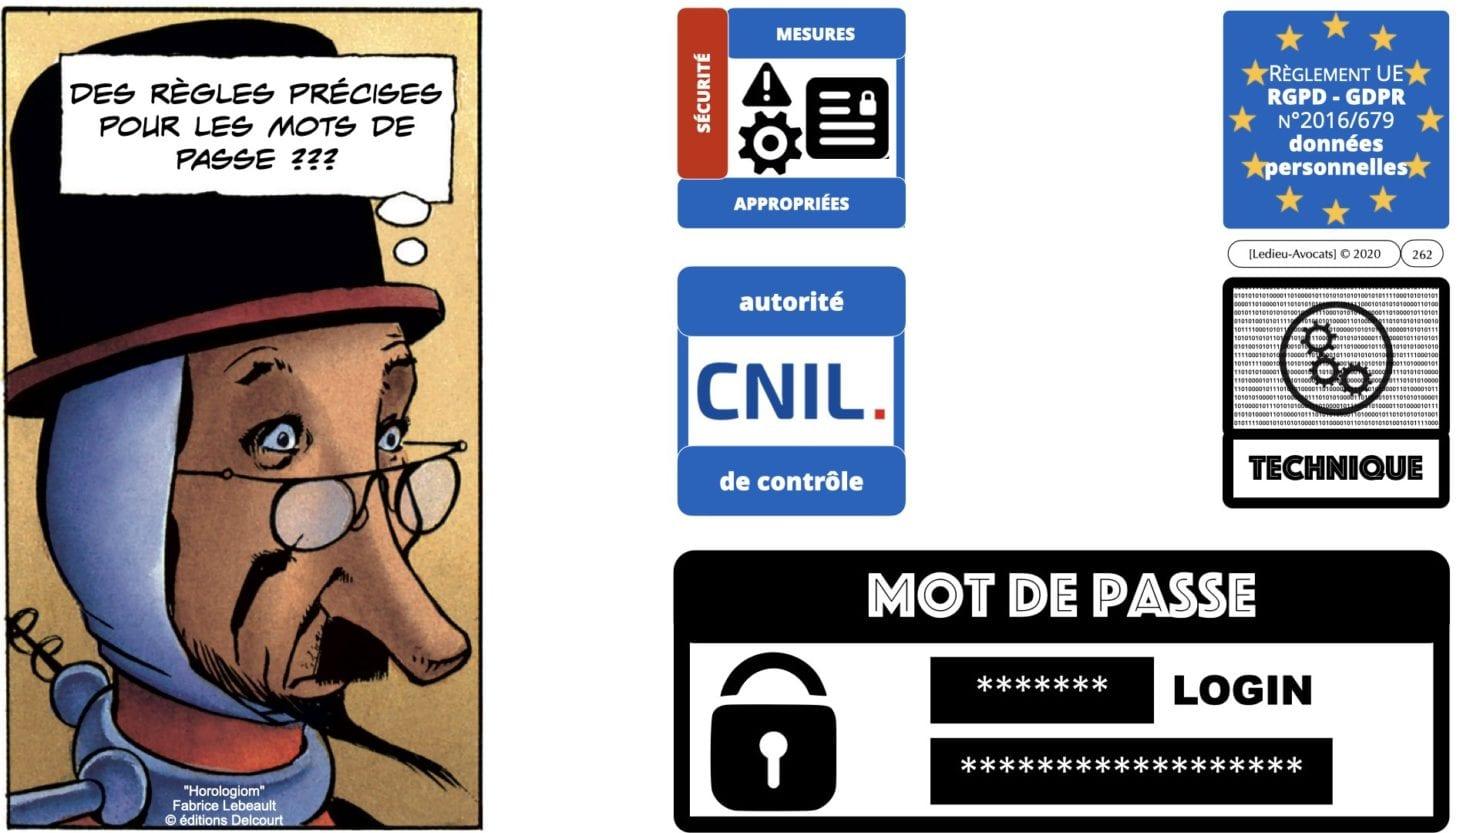 RGPD e-Privacy principes actualité jurisprudence ©Ledieu-Avocats 25-06-2021.262